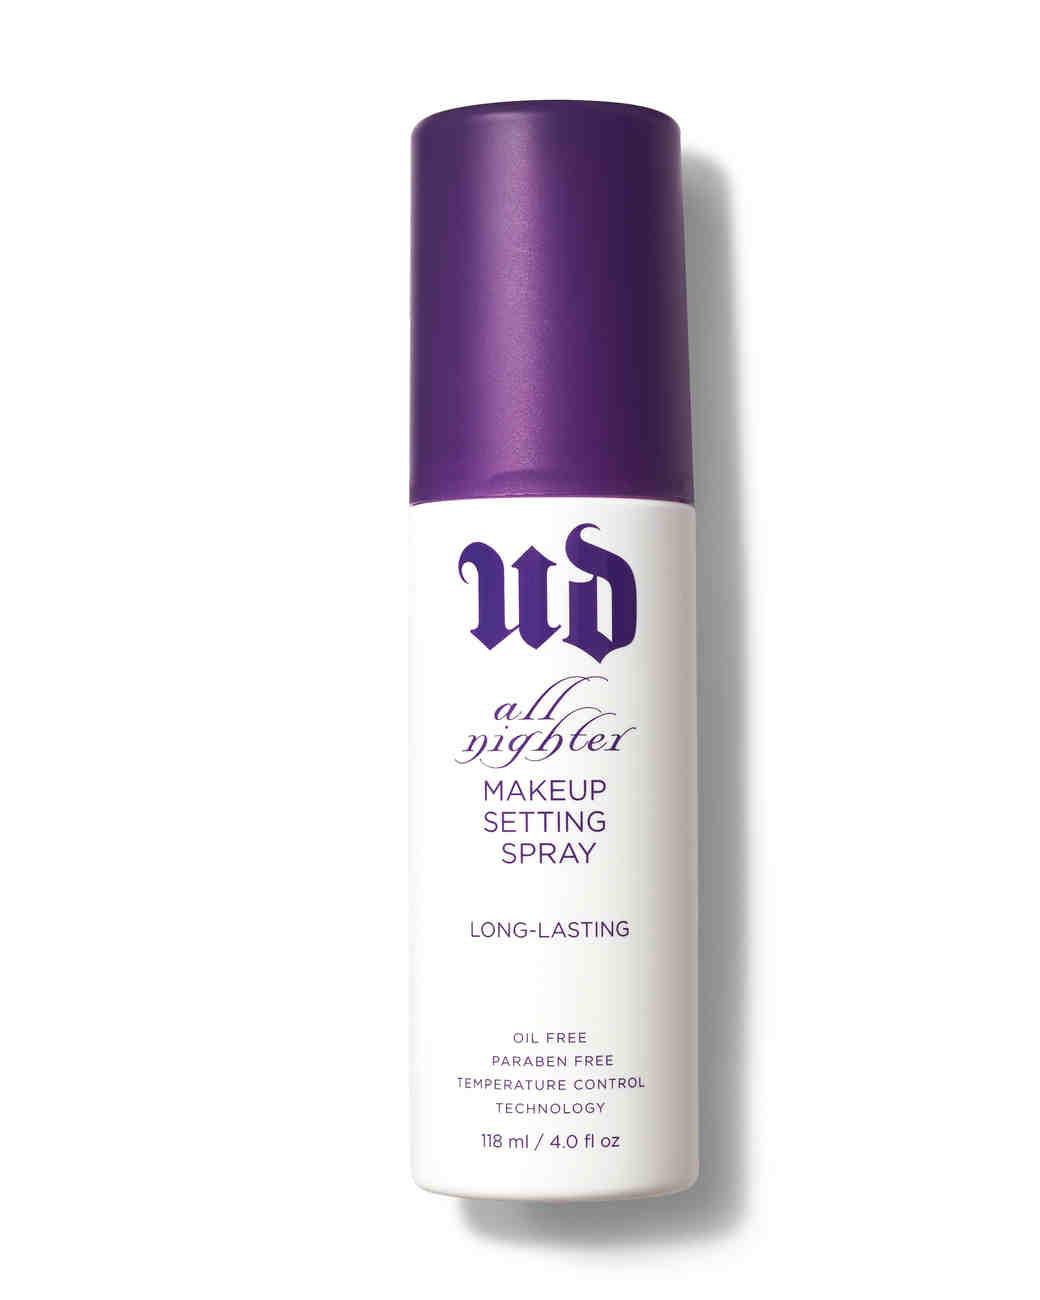 makeup-setting-spray-h359-d111715.jpg